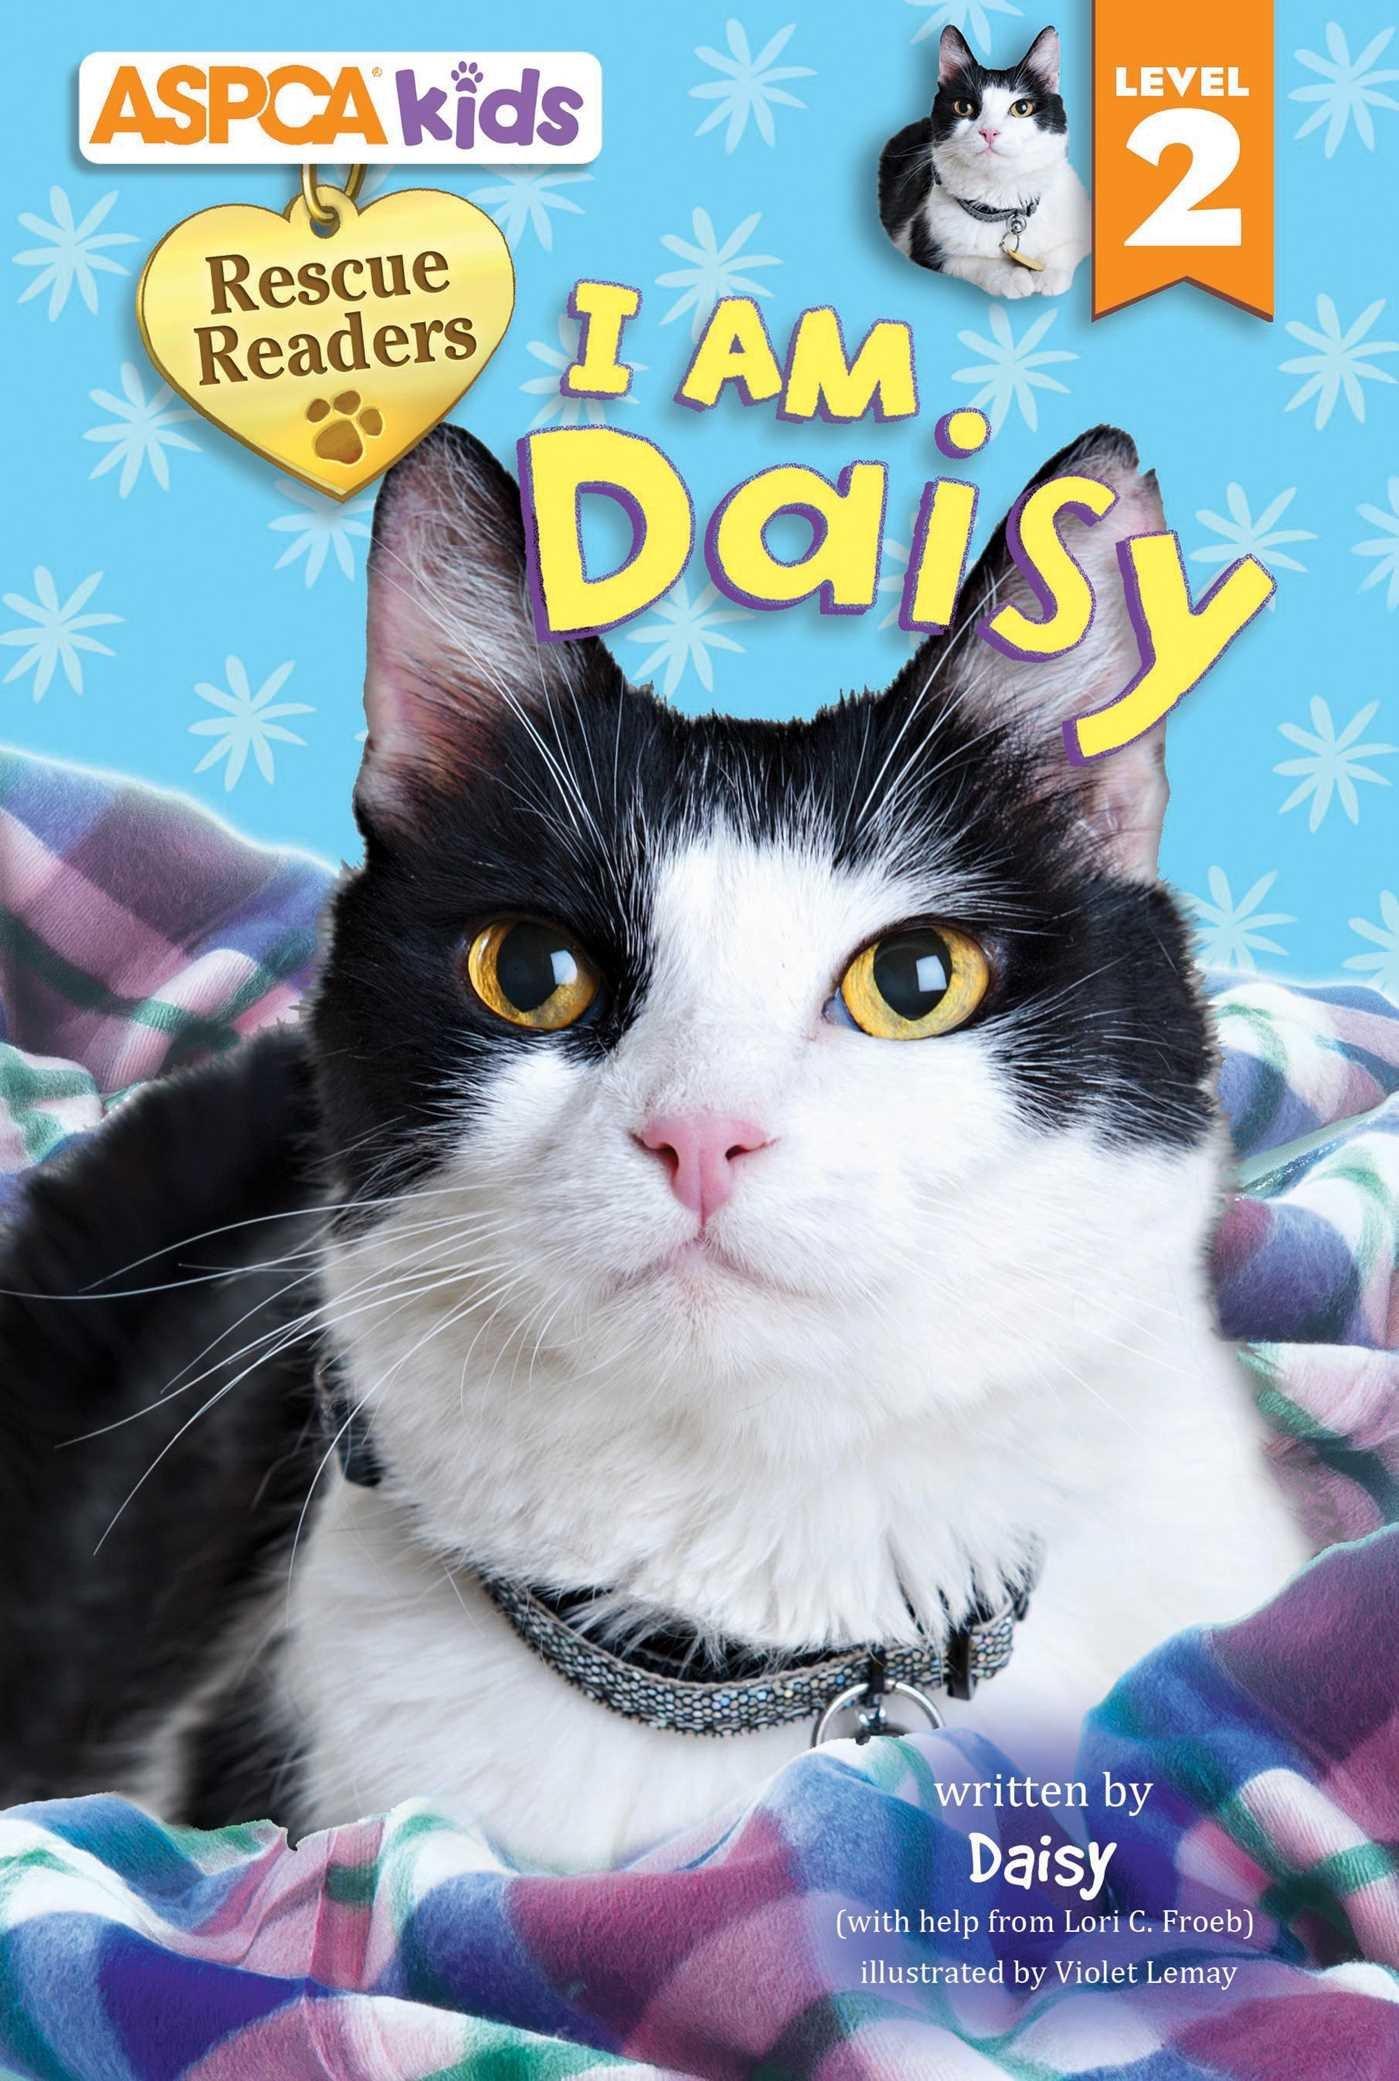 ASPCA kids: Rescue Readers: I Am Daisy: Level 2 (ASPCA Rescue Readers) pdf epub